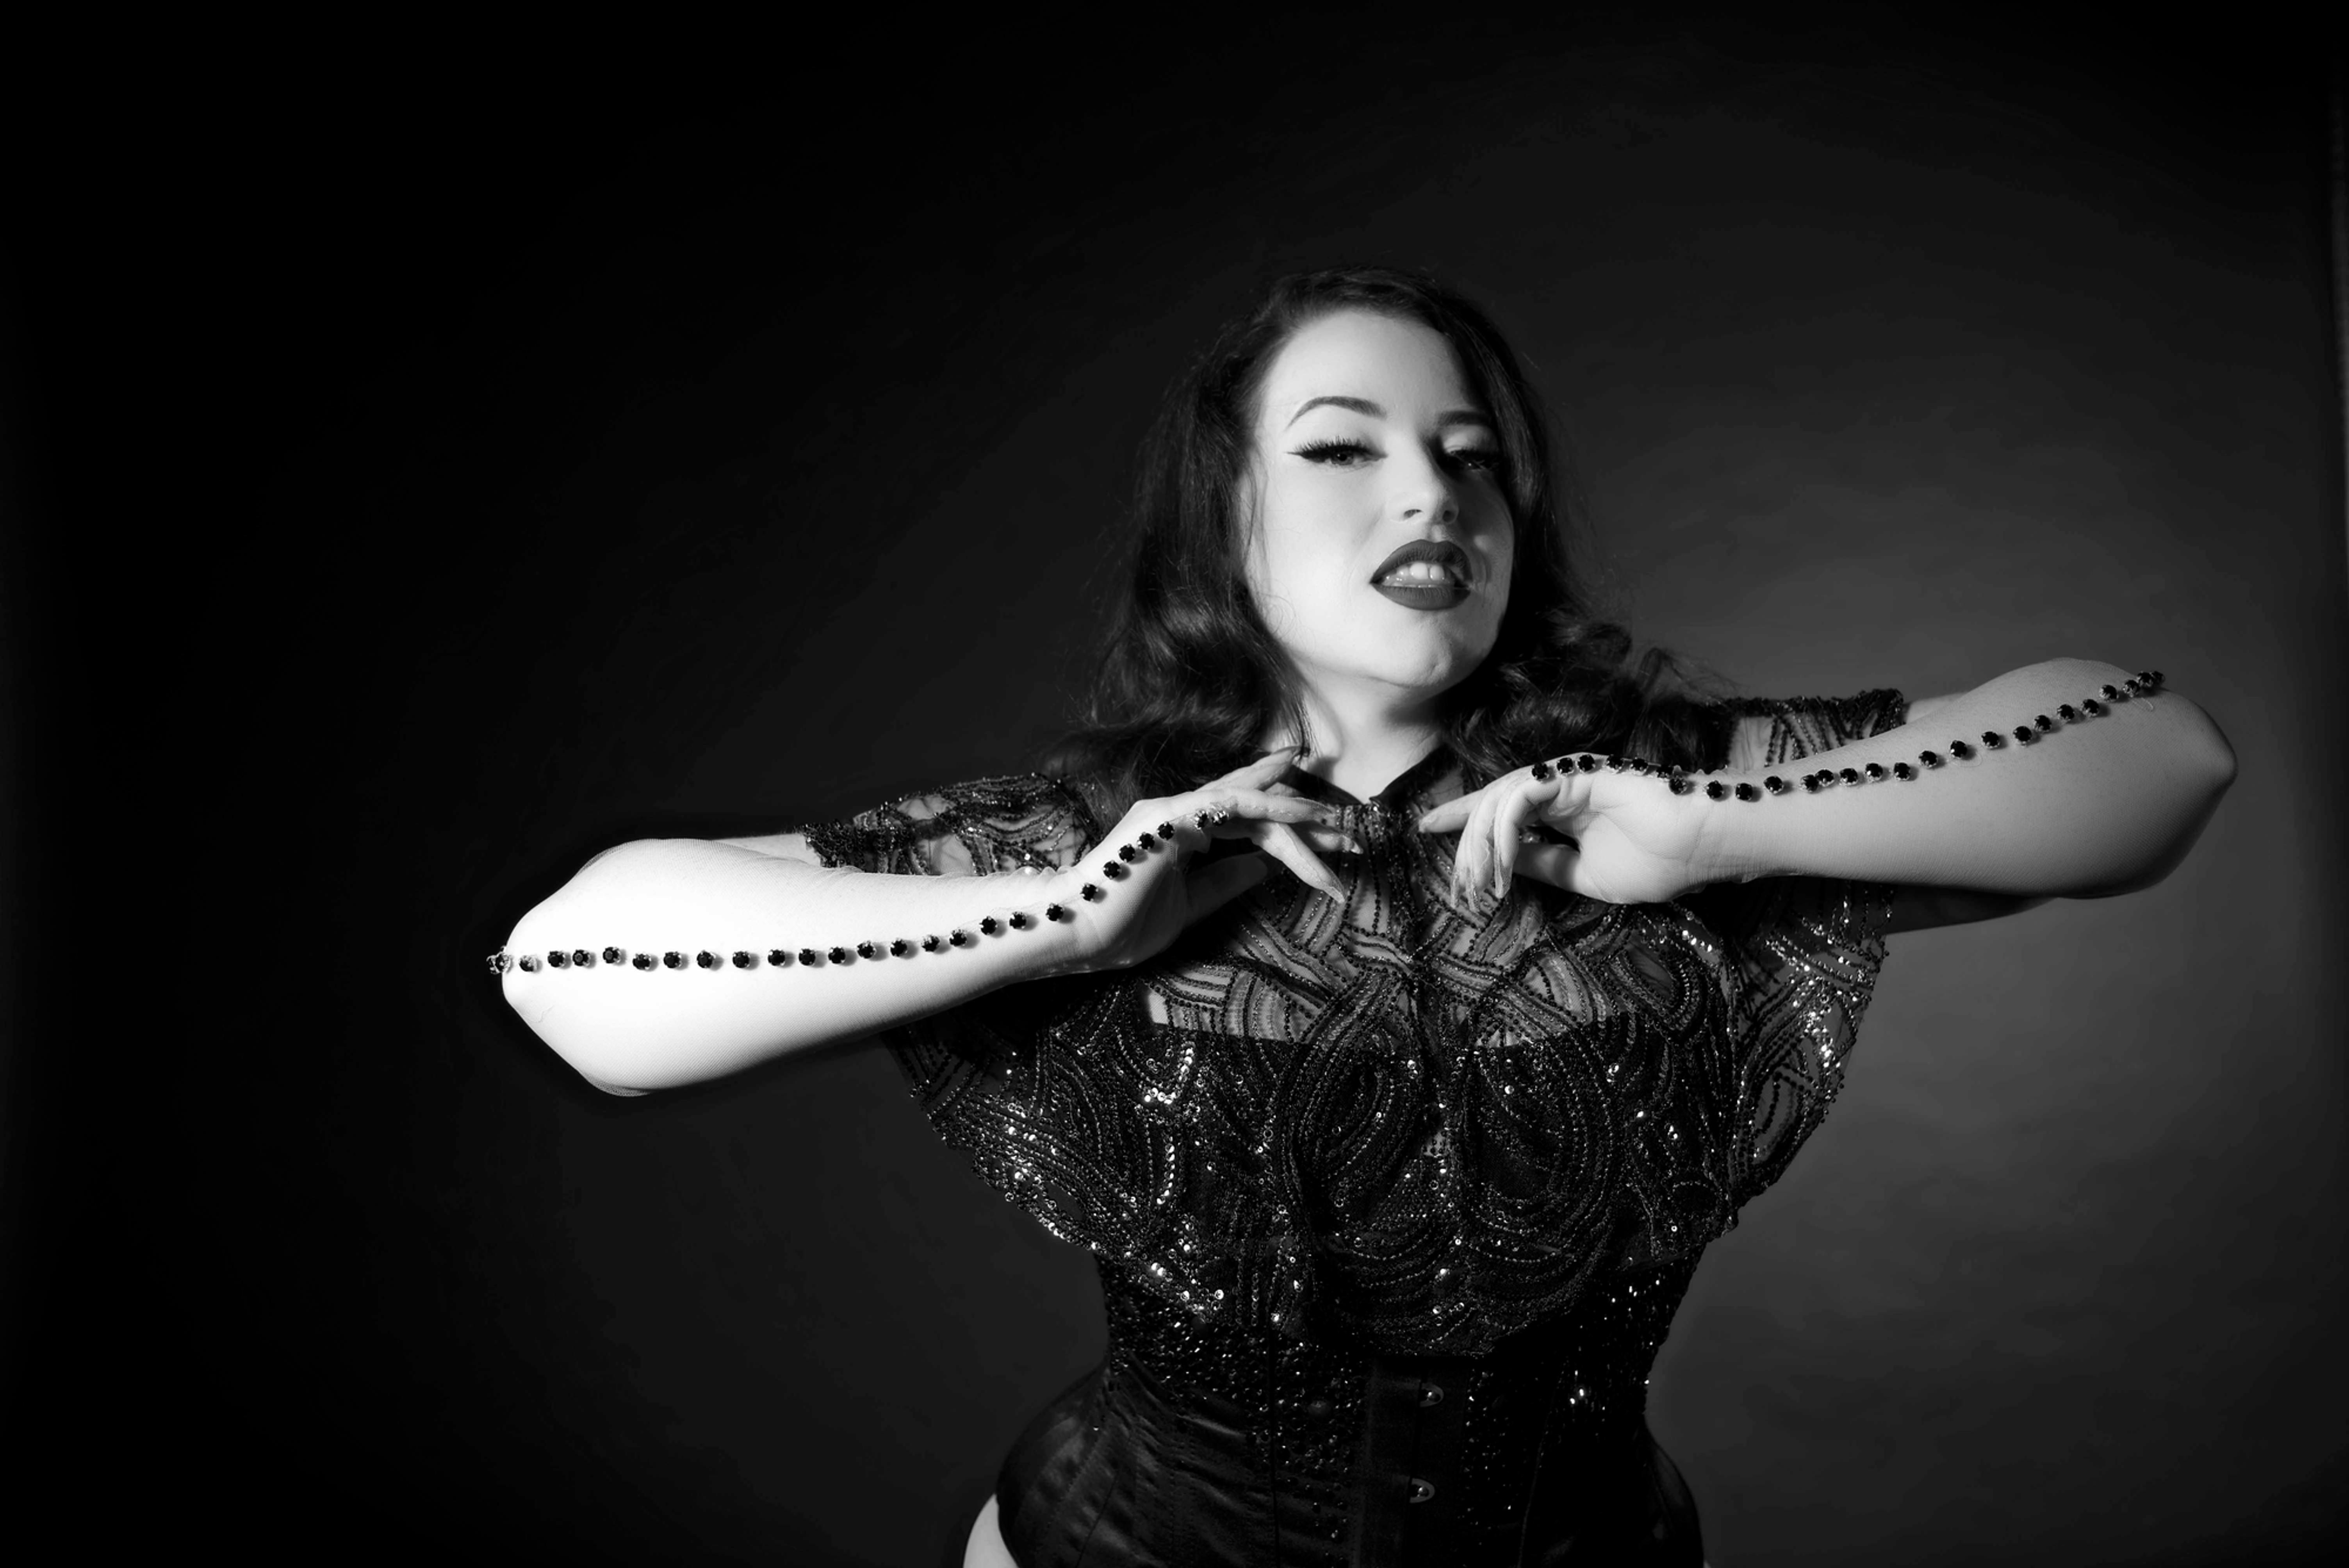 Film Noir Photoshoot - 3rd April